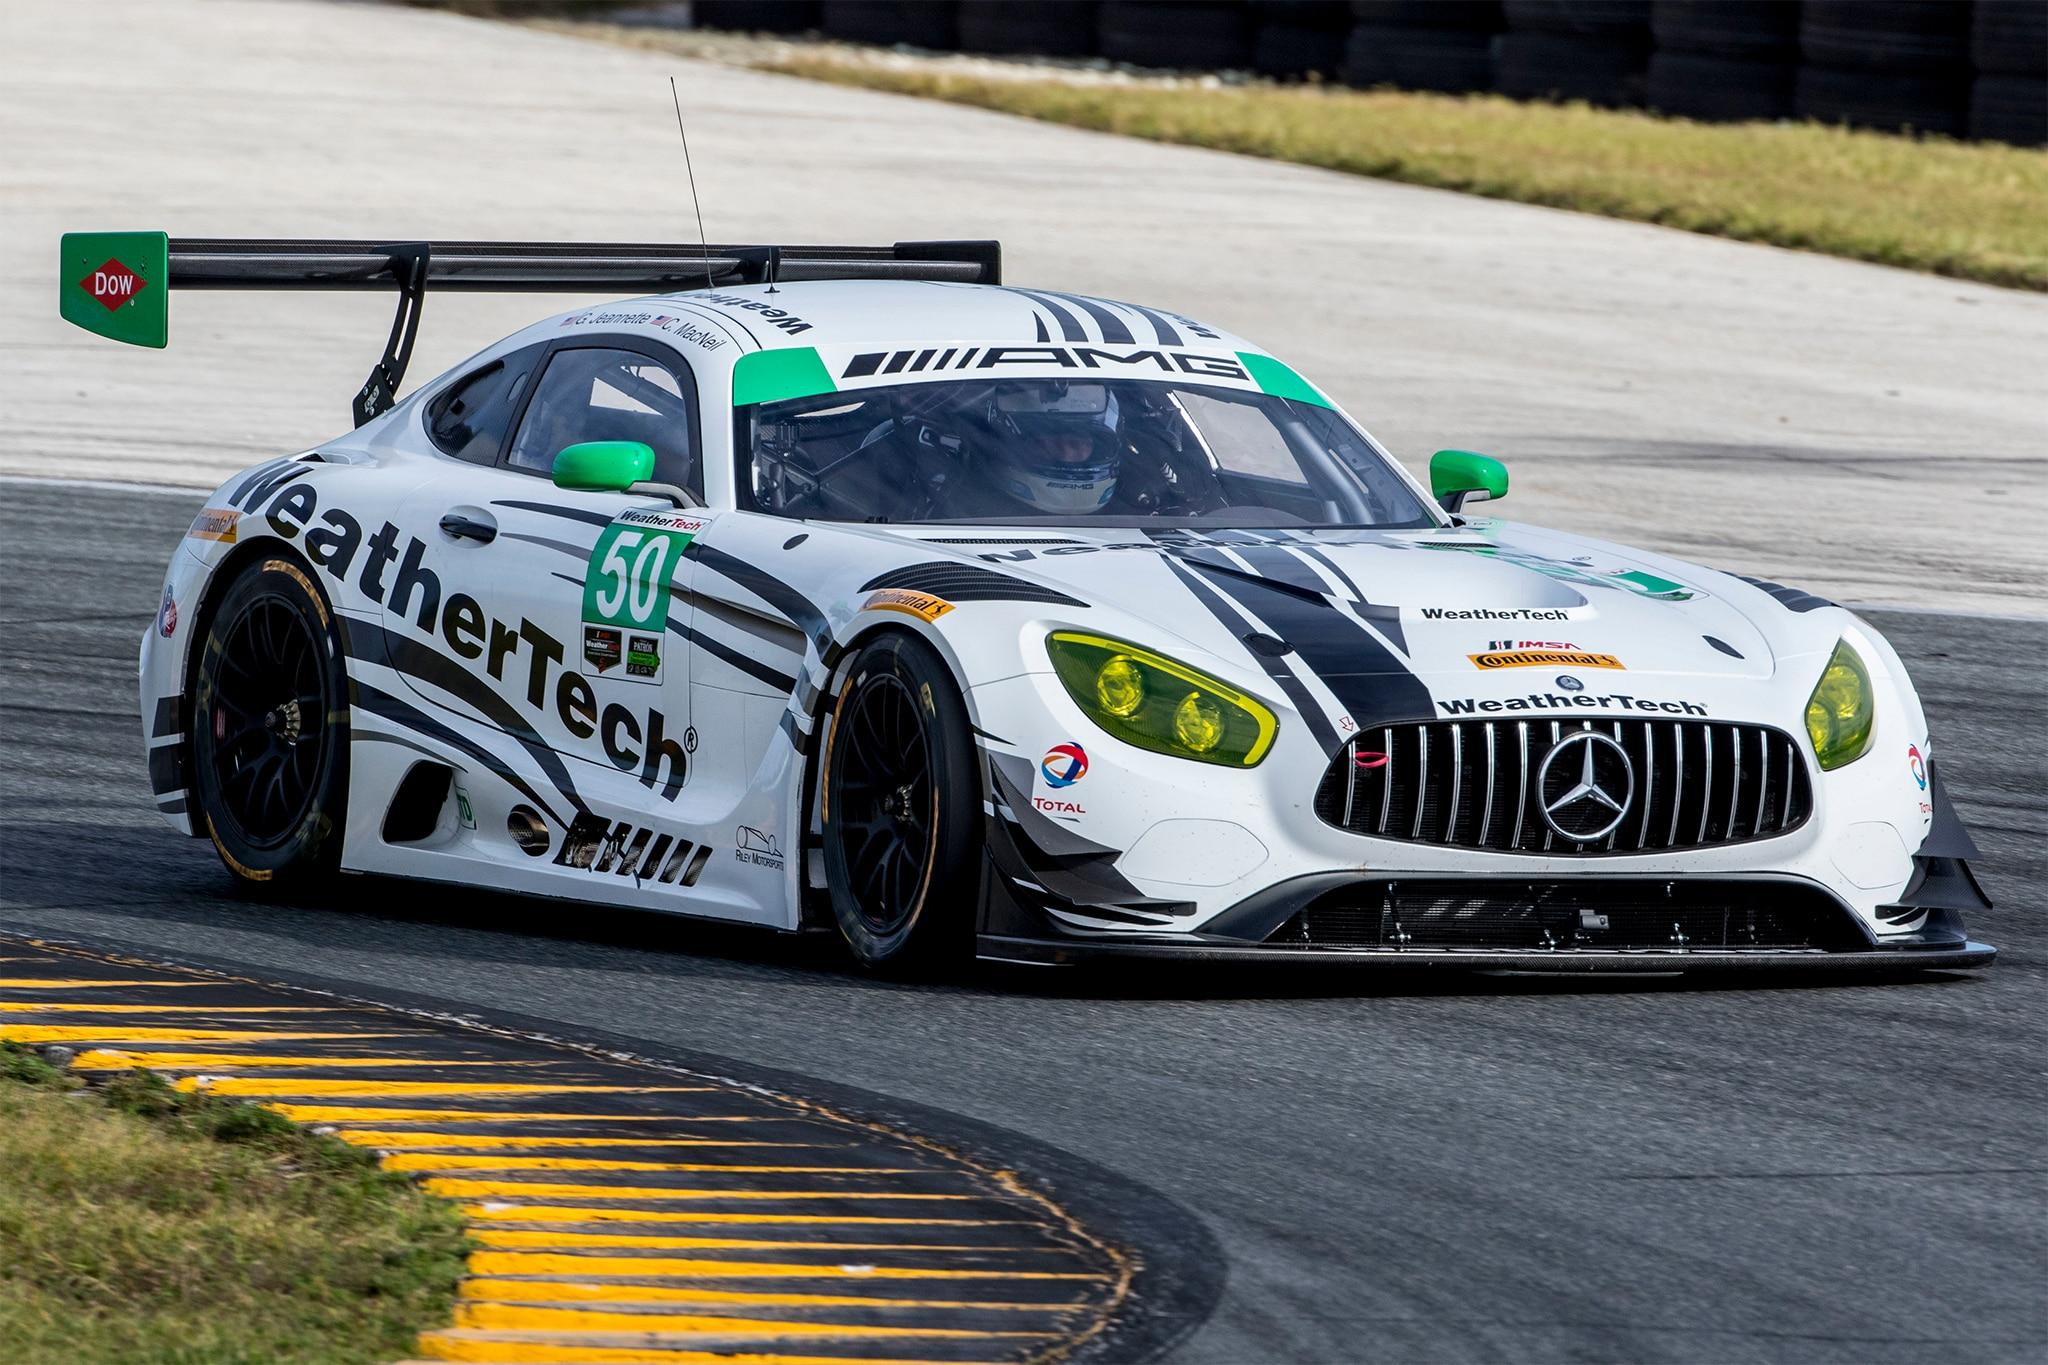 Mercedes AMG GT3 IMSA WeatherTech Race Car Front Three Quarter In Motion 12